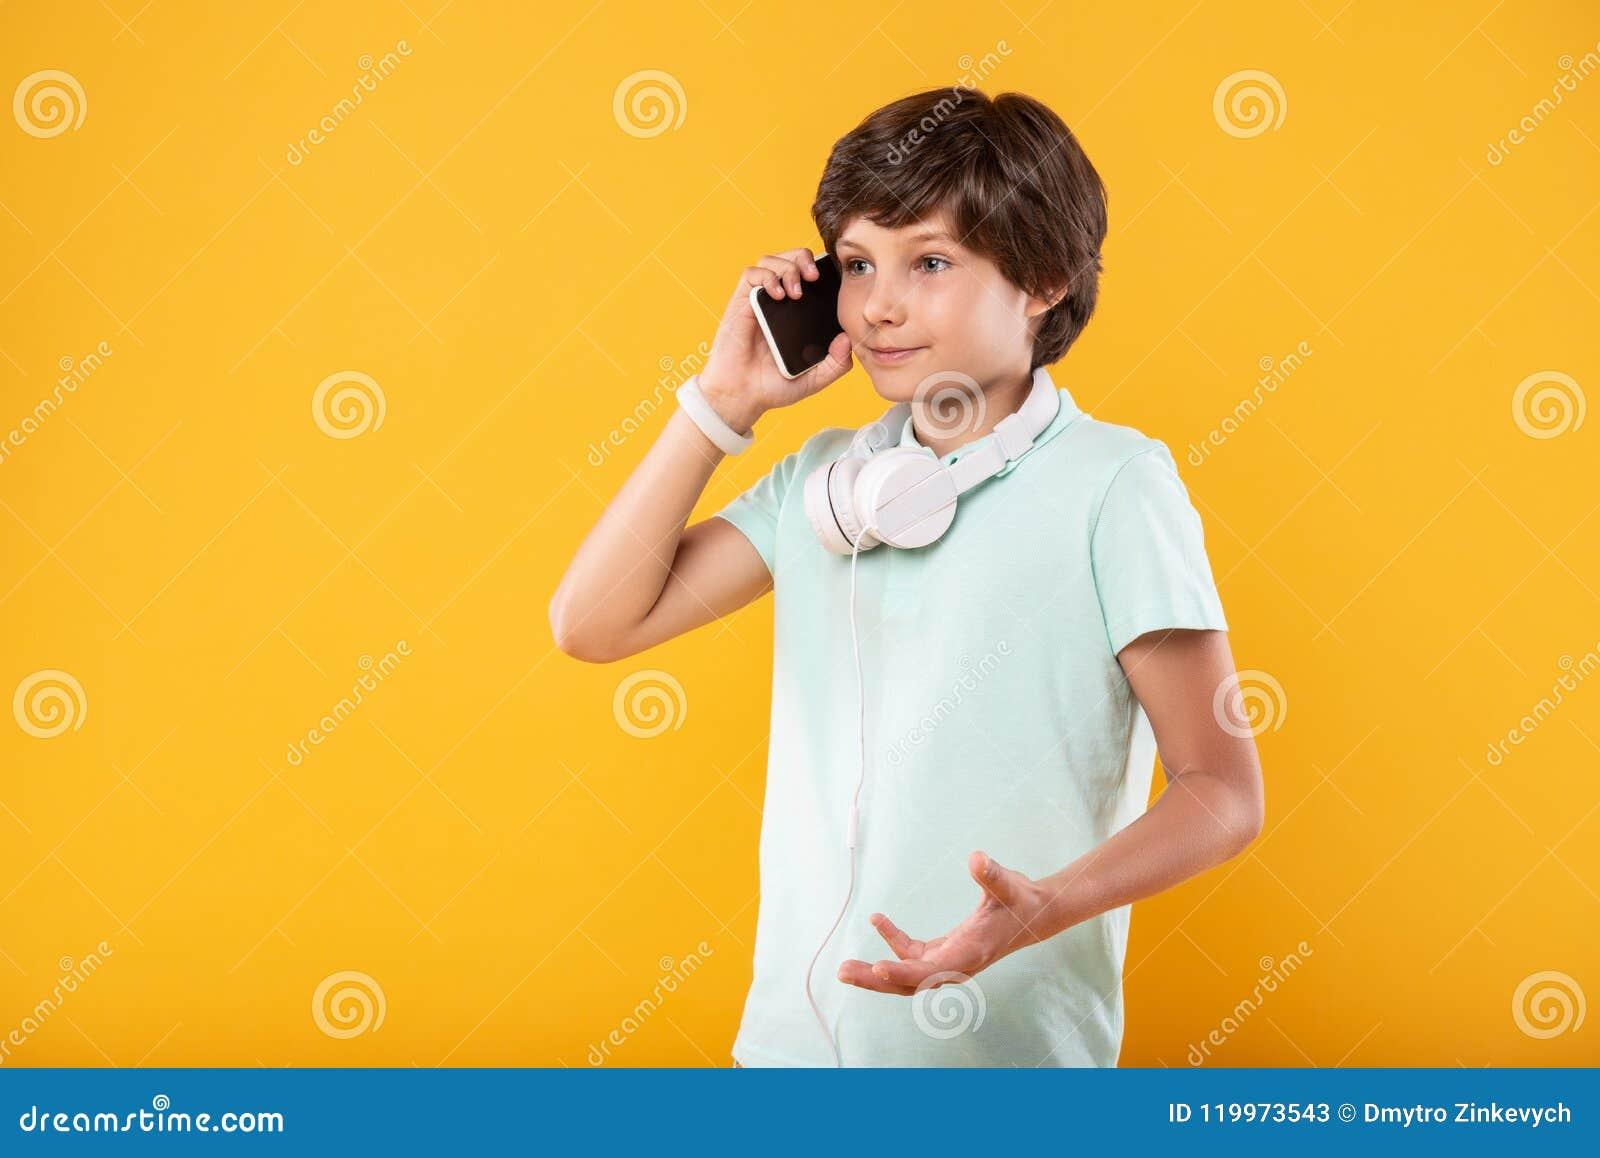 Waakzaam kind die op de telefoon spreken